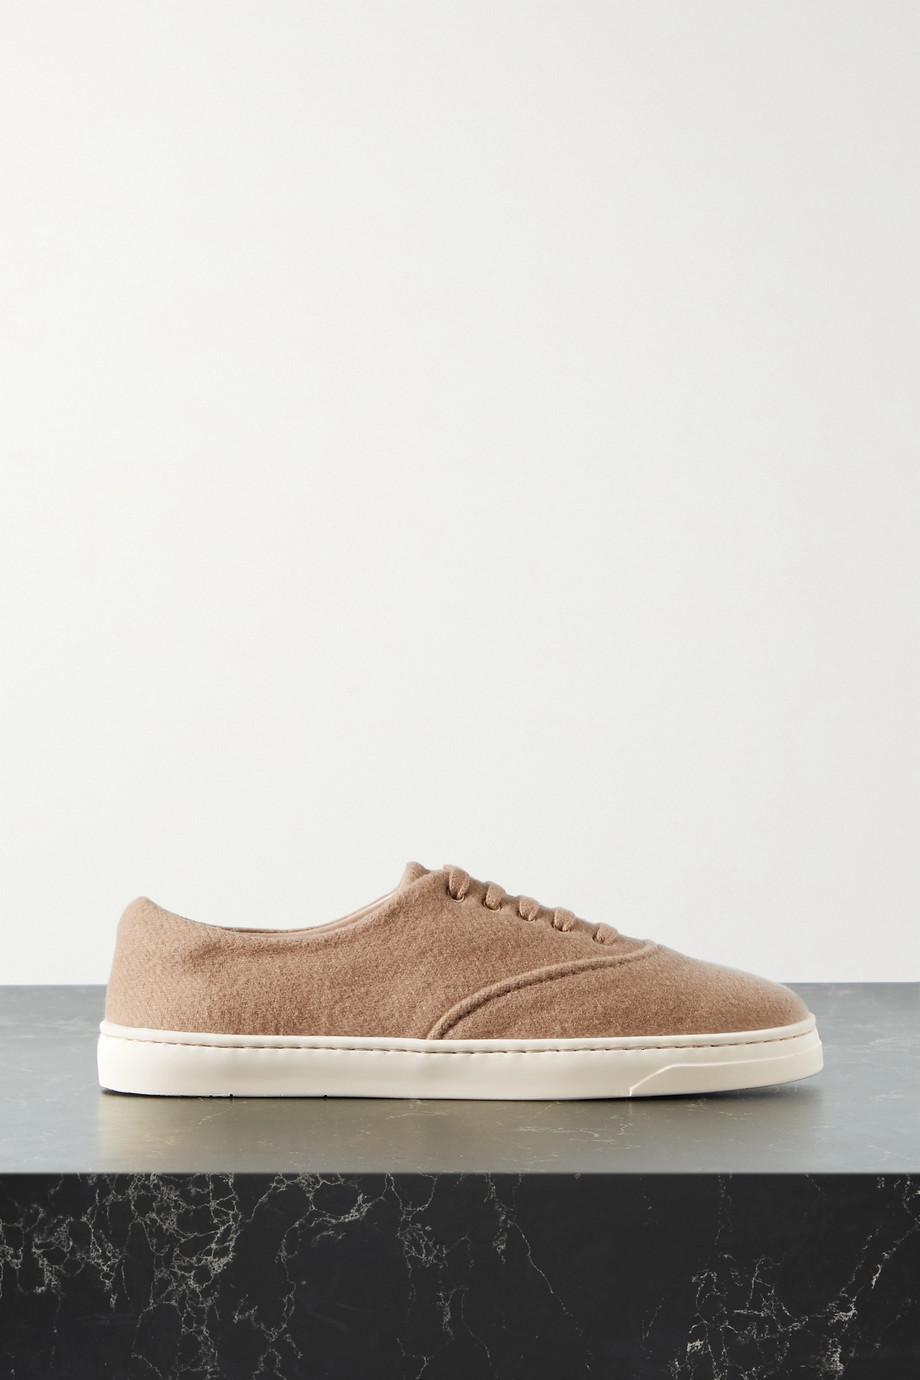 Gabriela Hearst Marcello cashmere sneakers